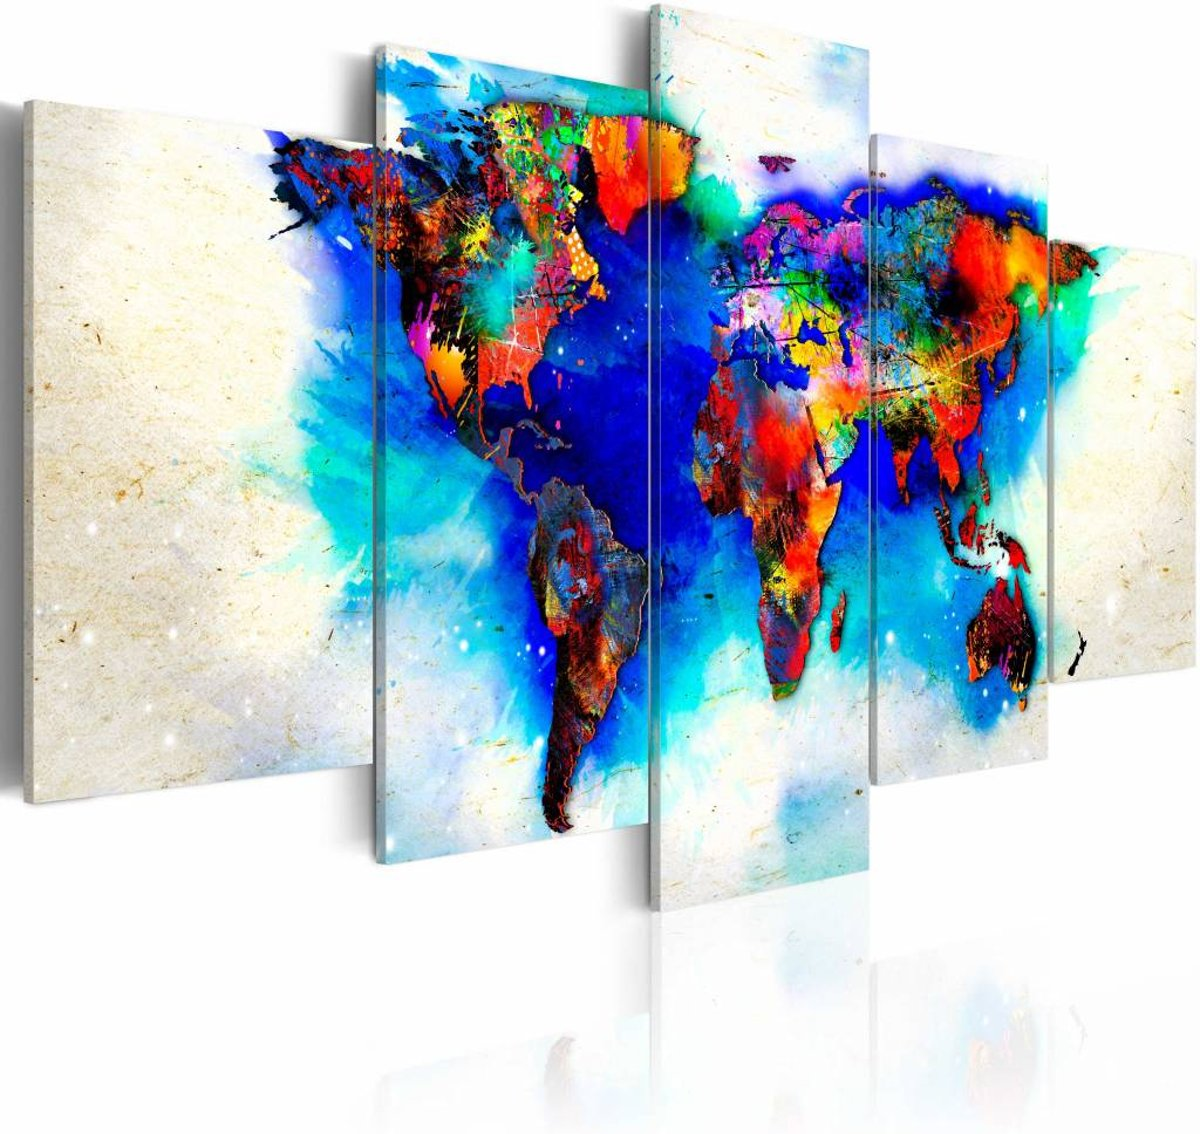 Schilderij - All colors of the world - 200x100